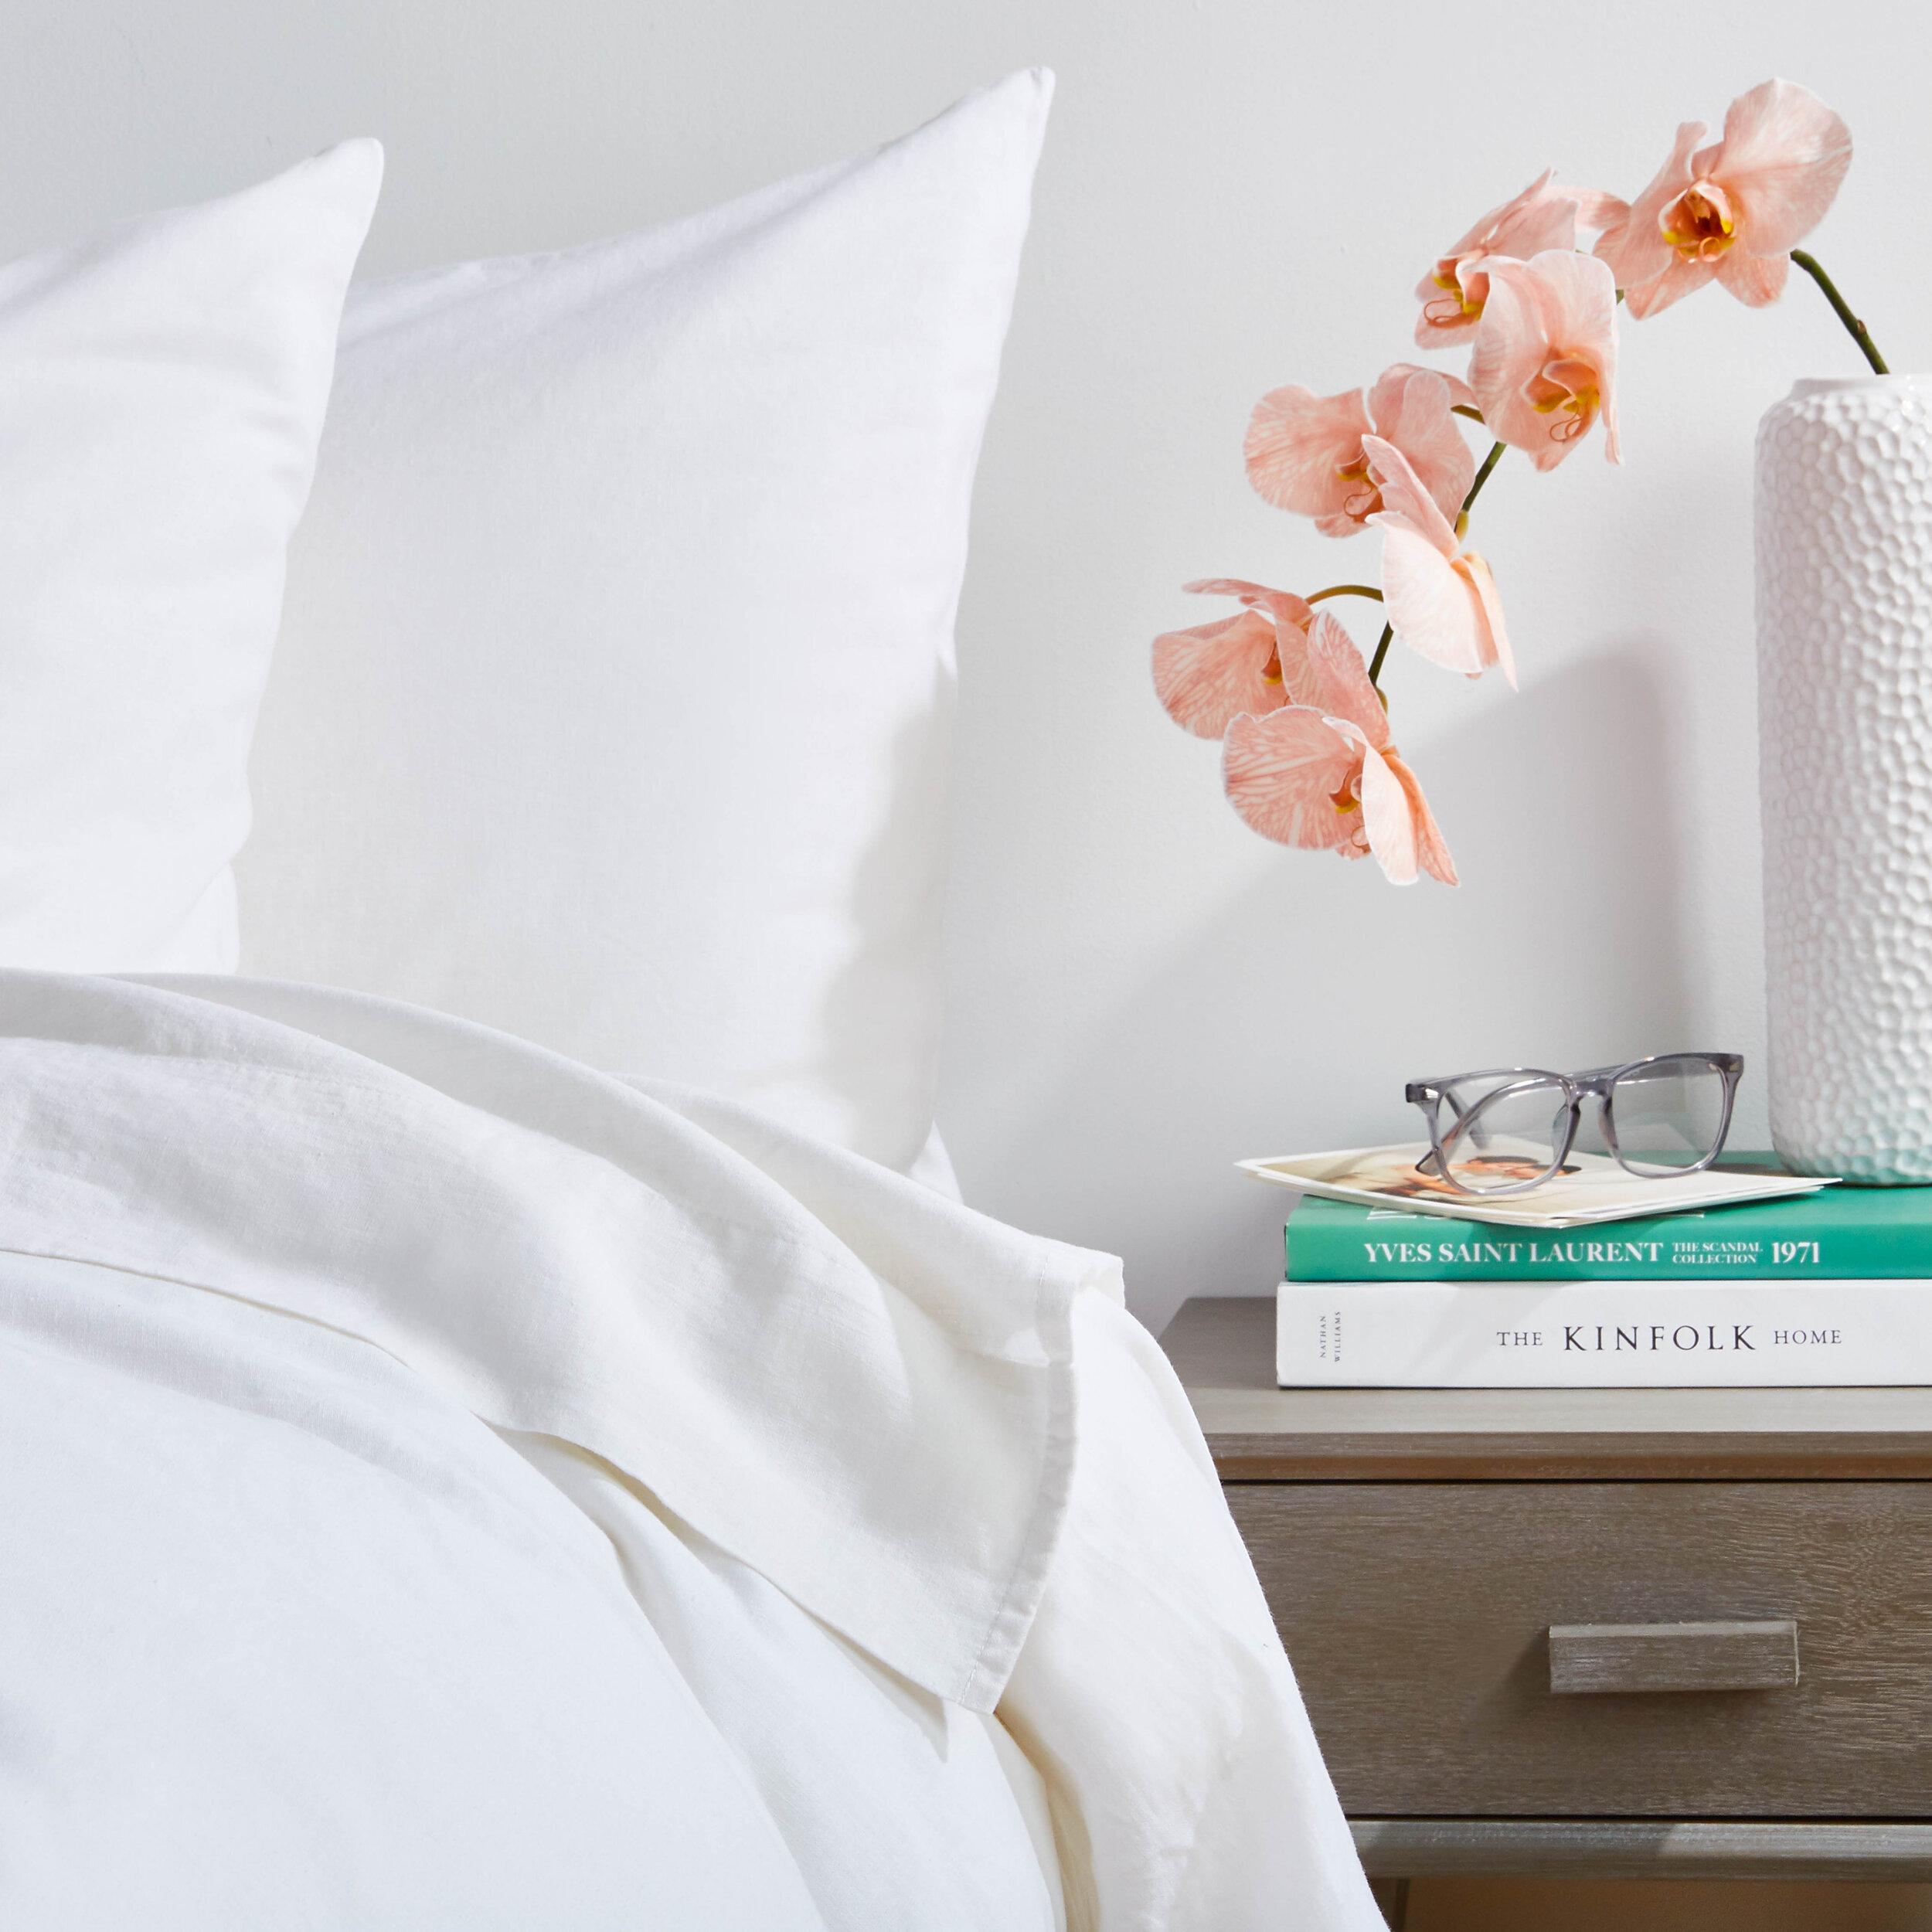 Zola Product Imagery 2019